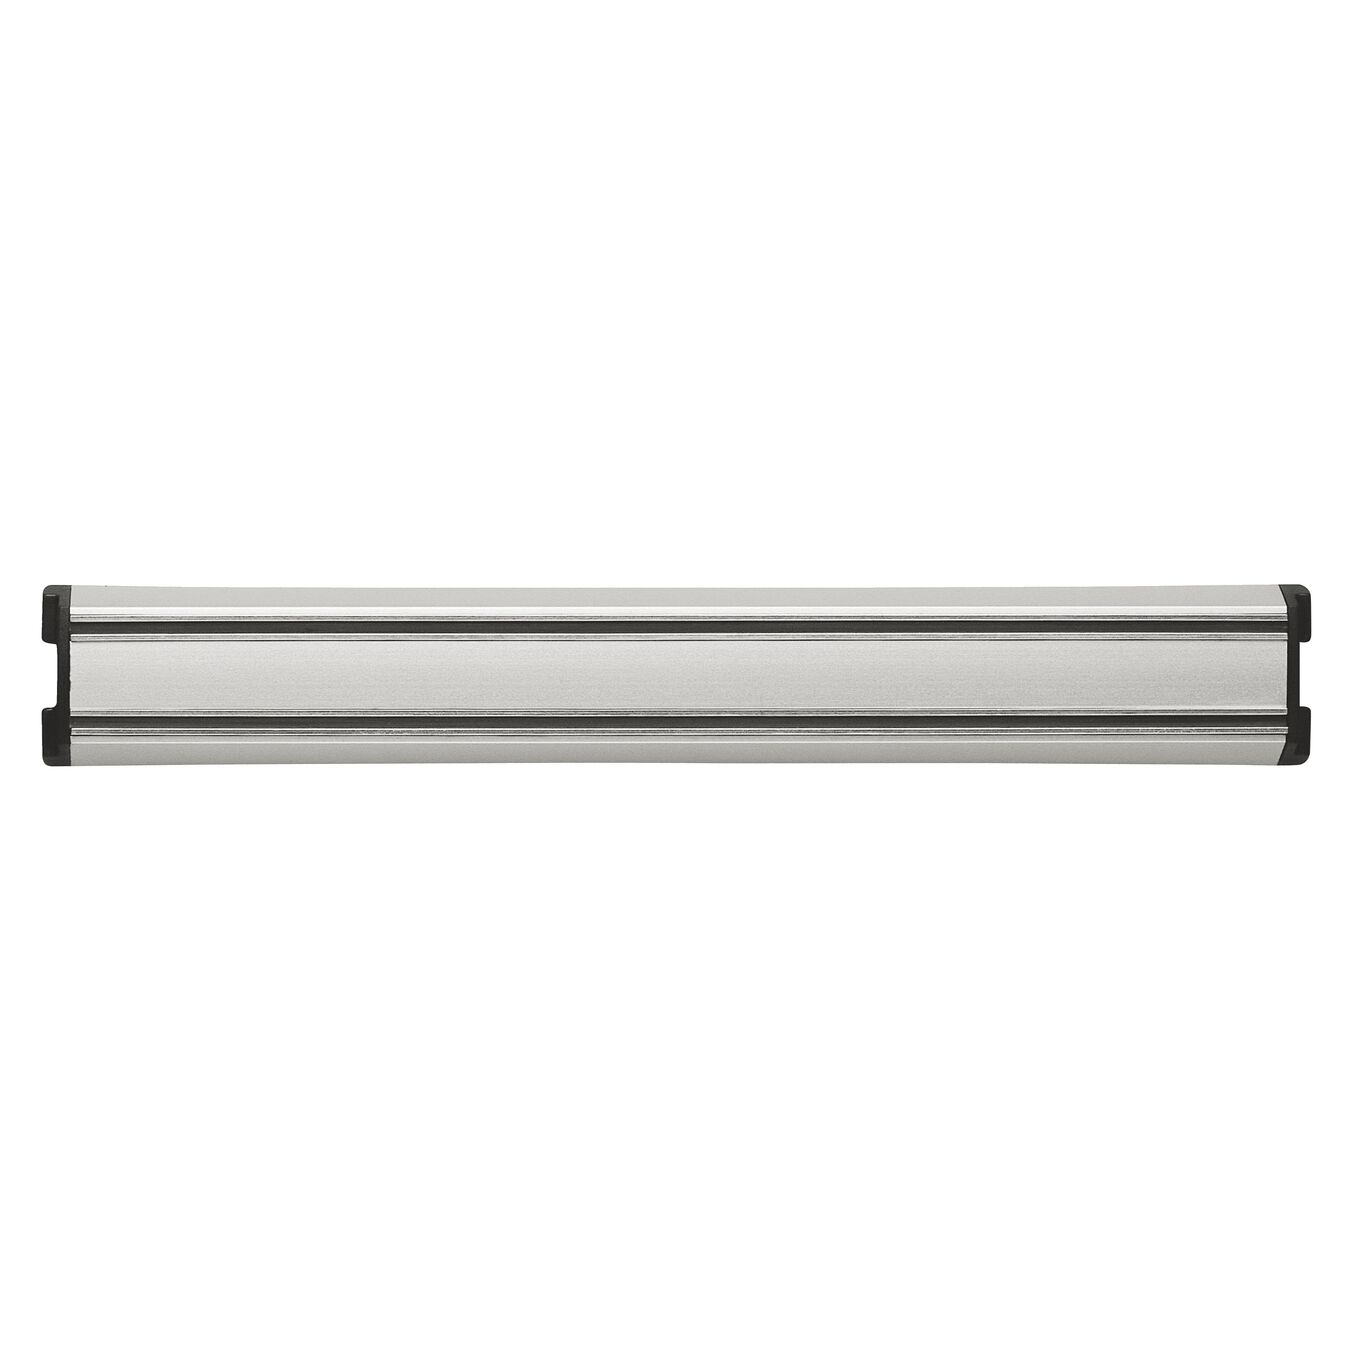 Magnetic knife bar 30 cm Aluminum,,large 1